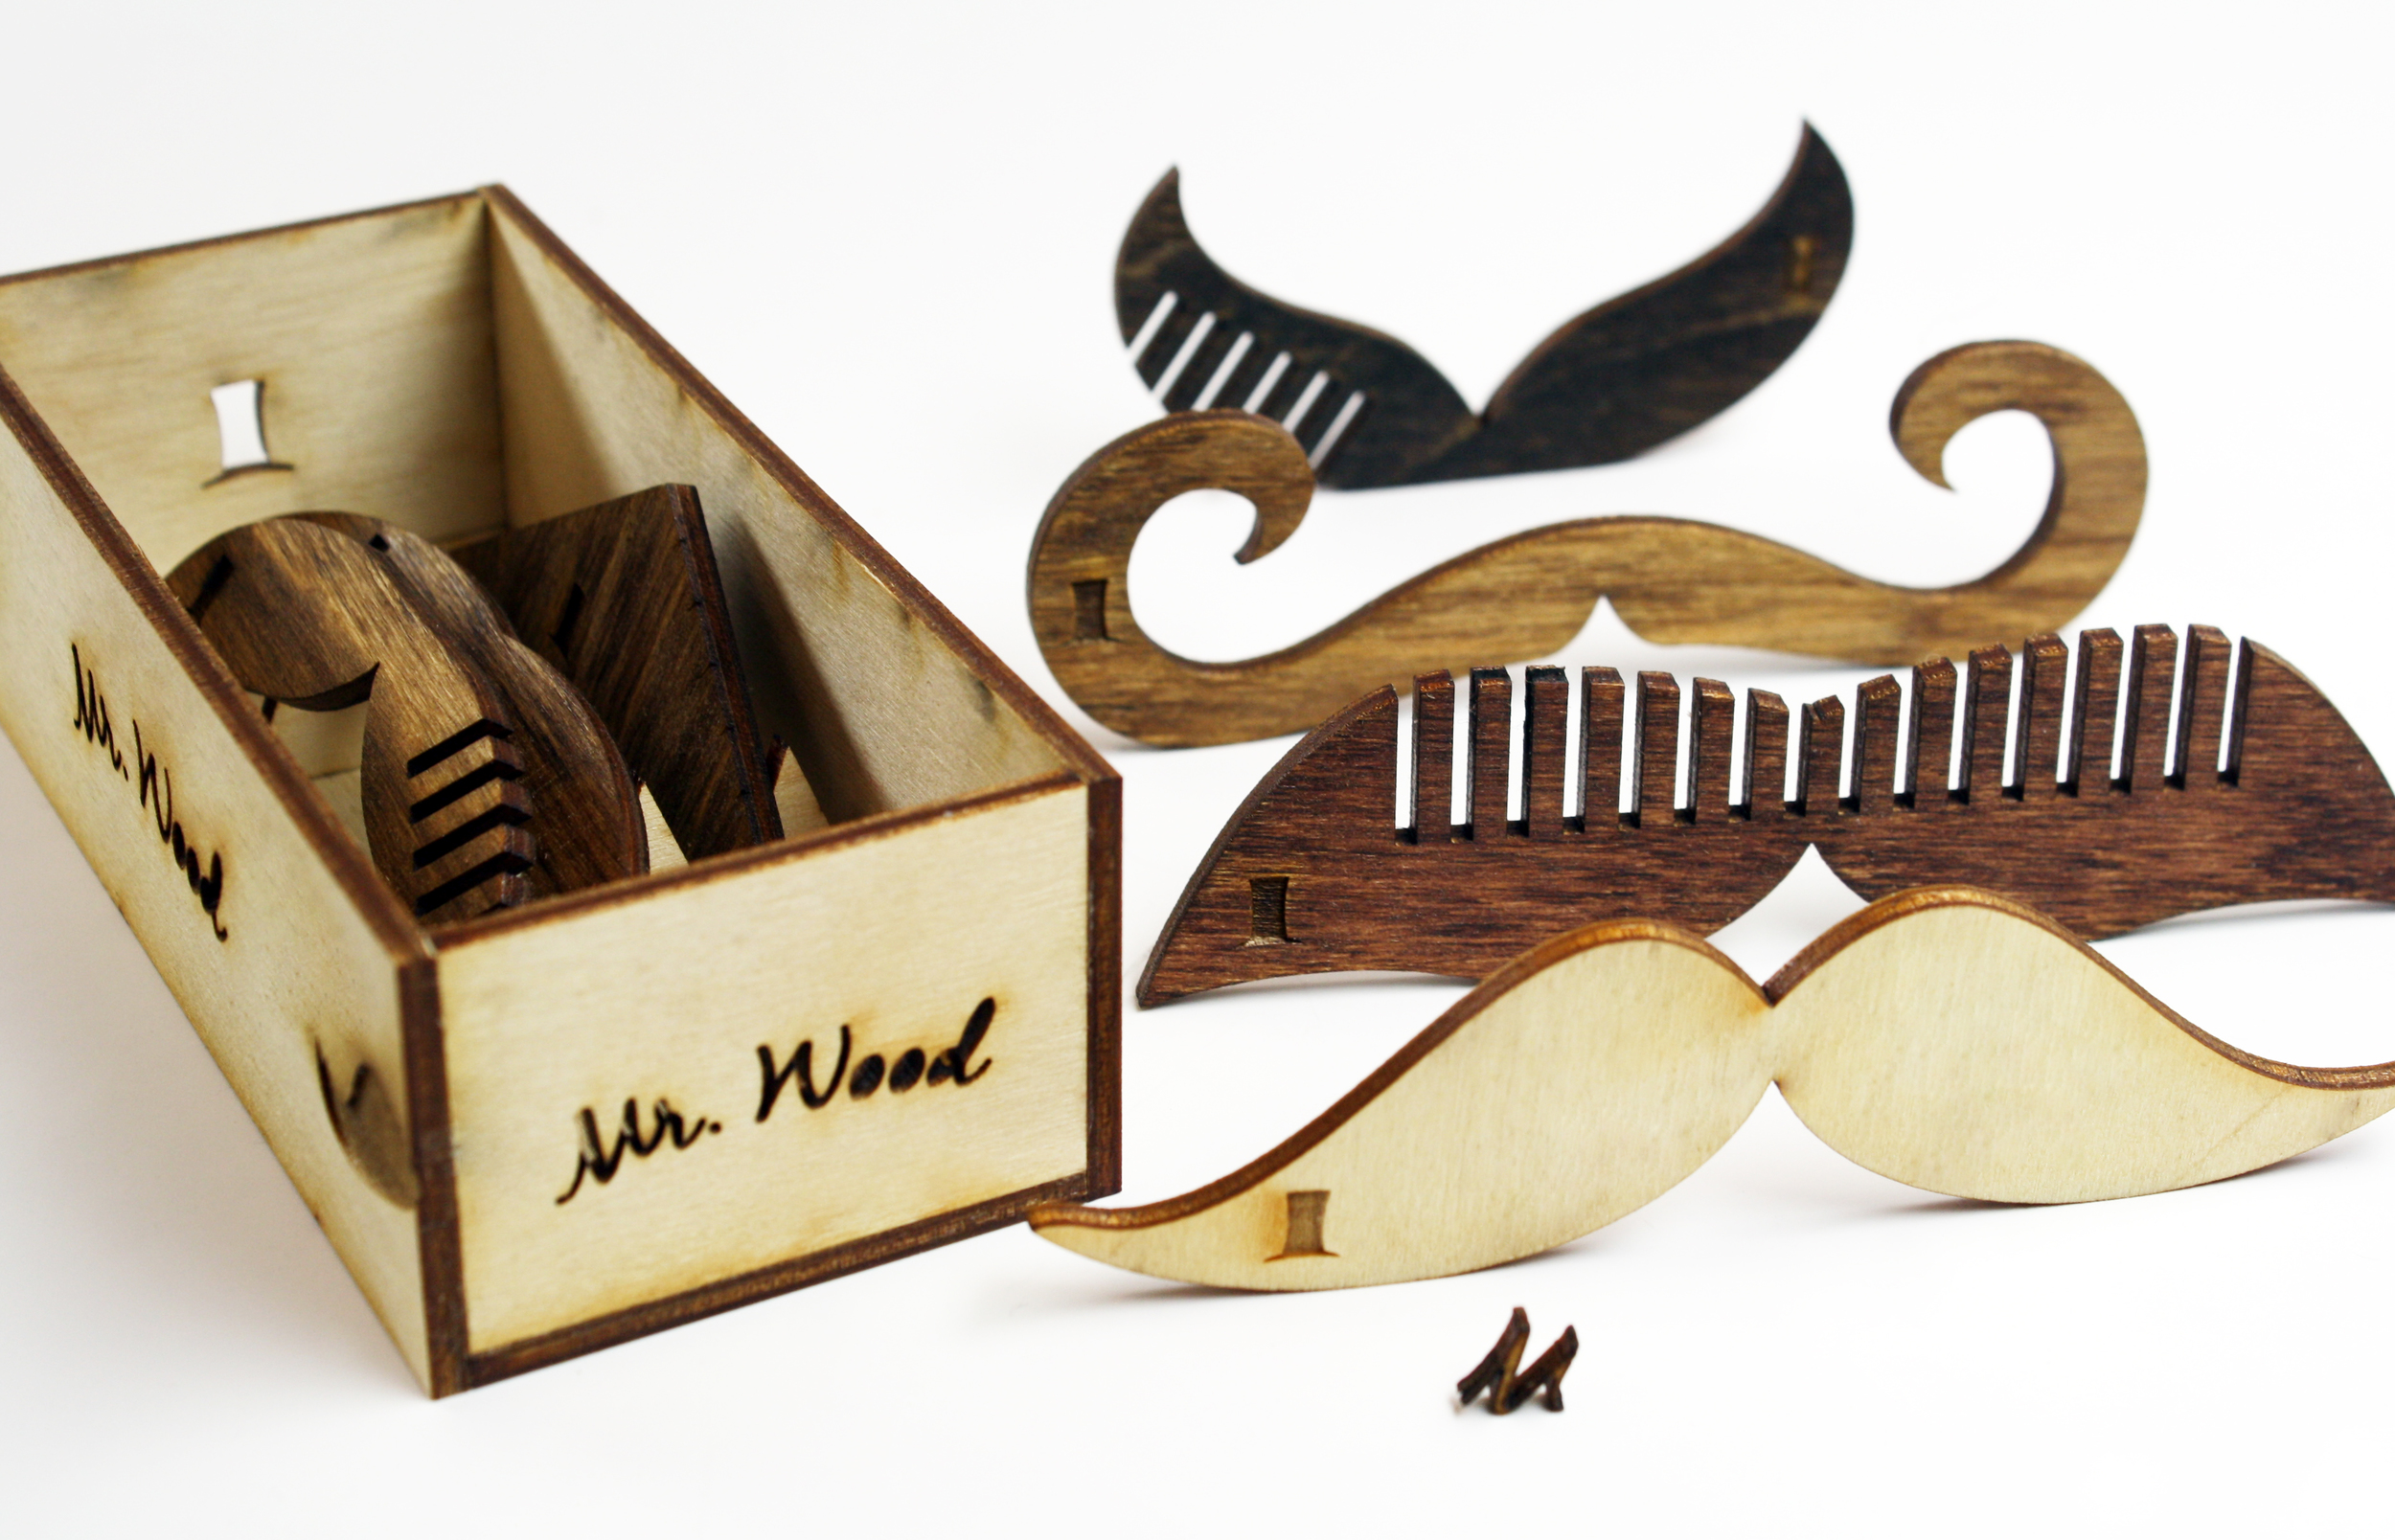 mr-wood.jpg